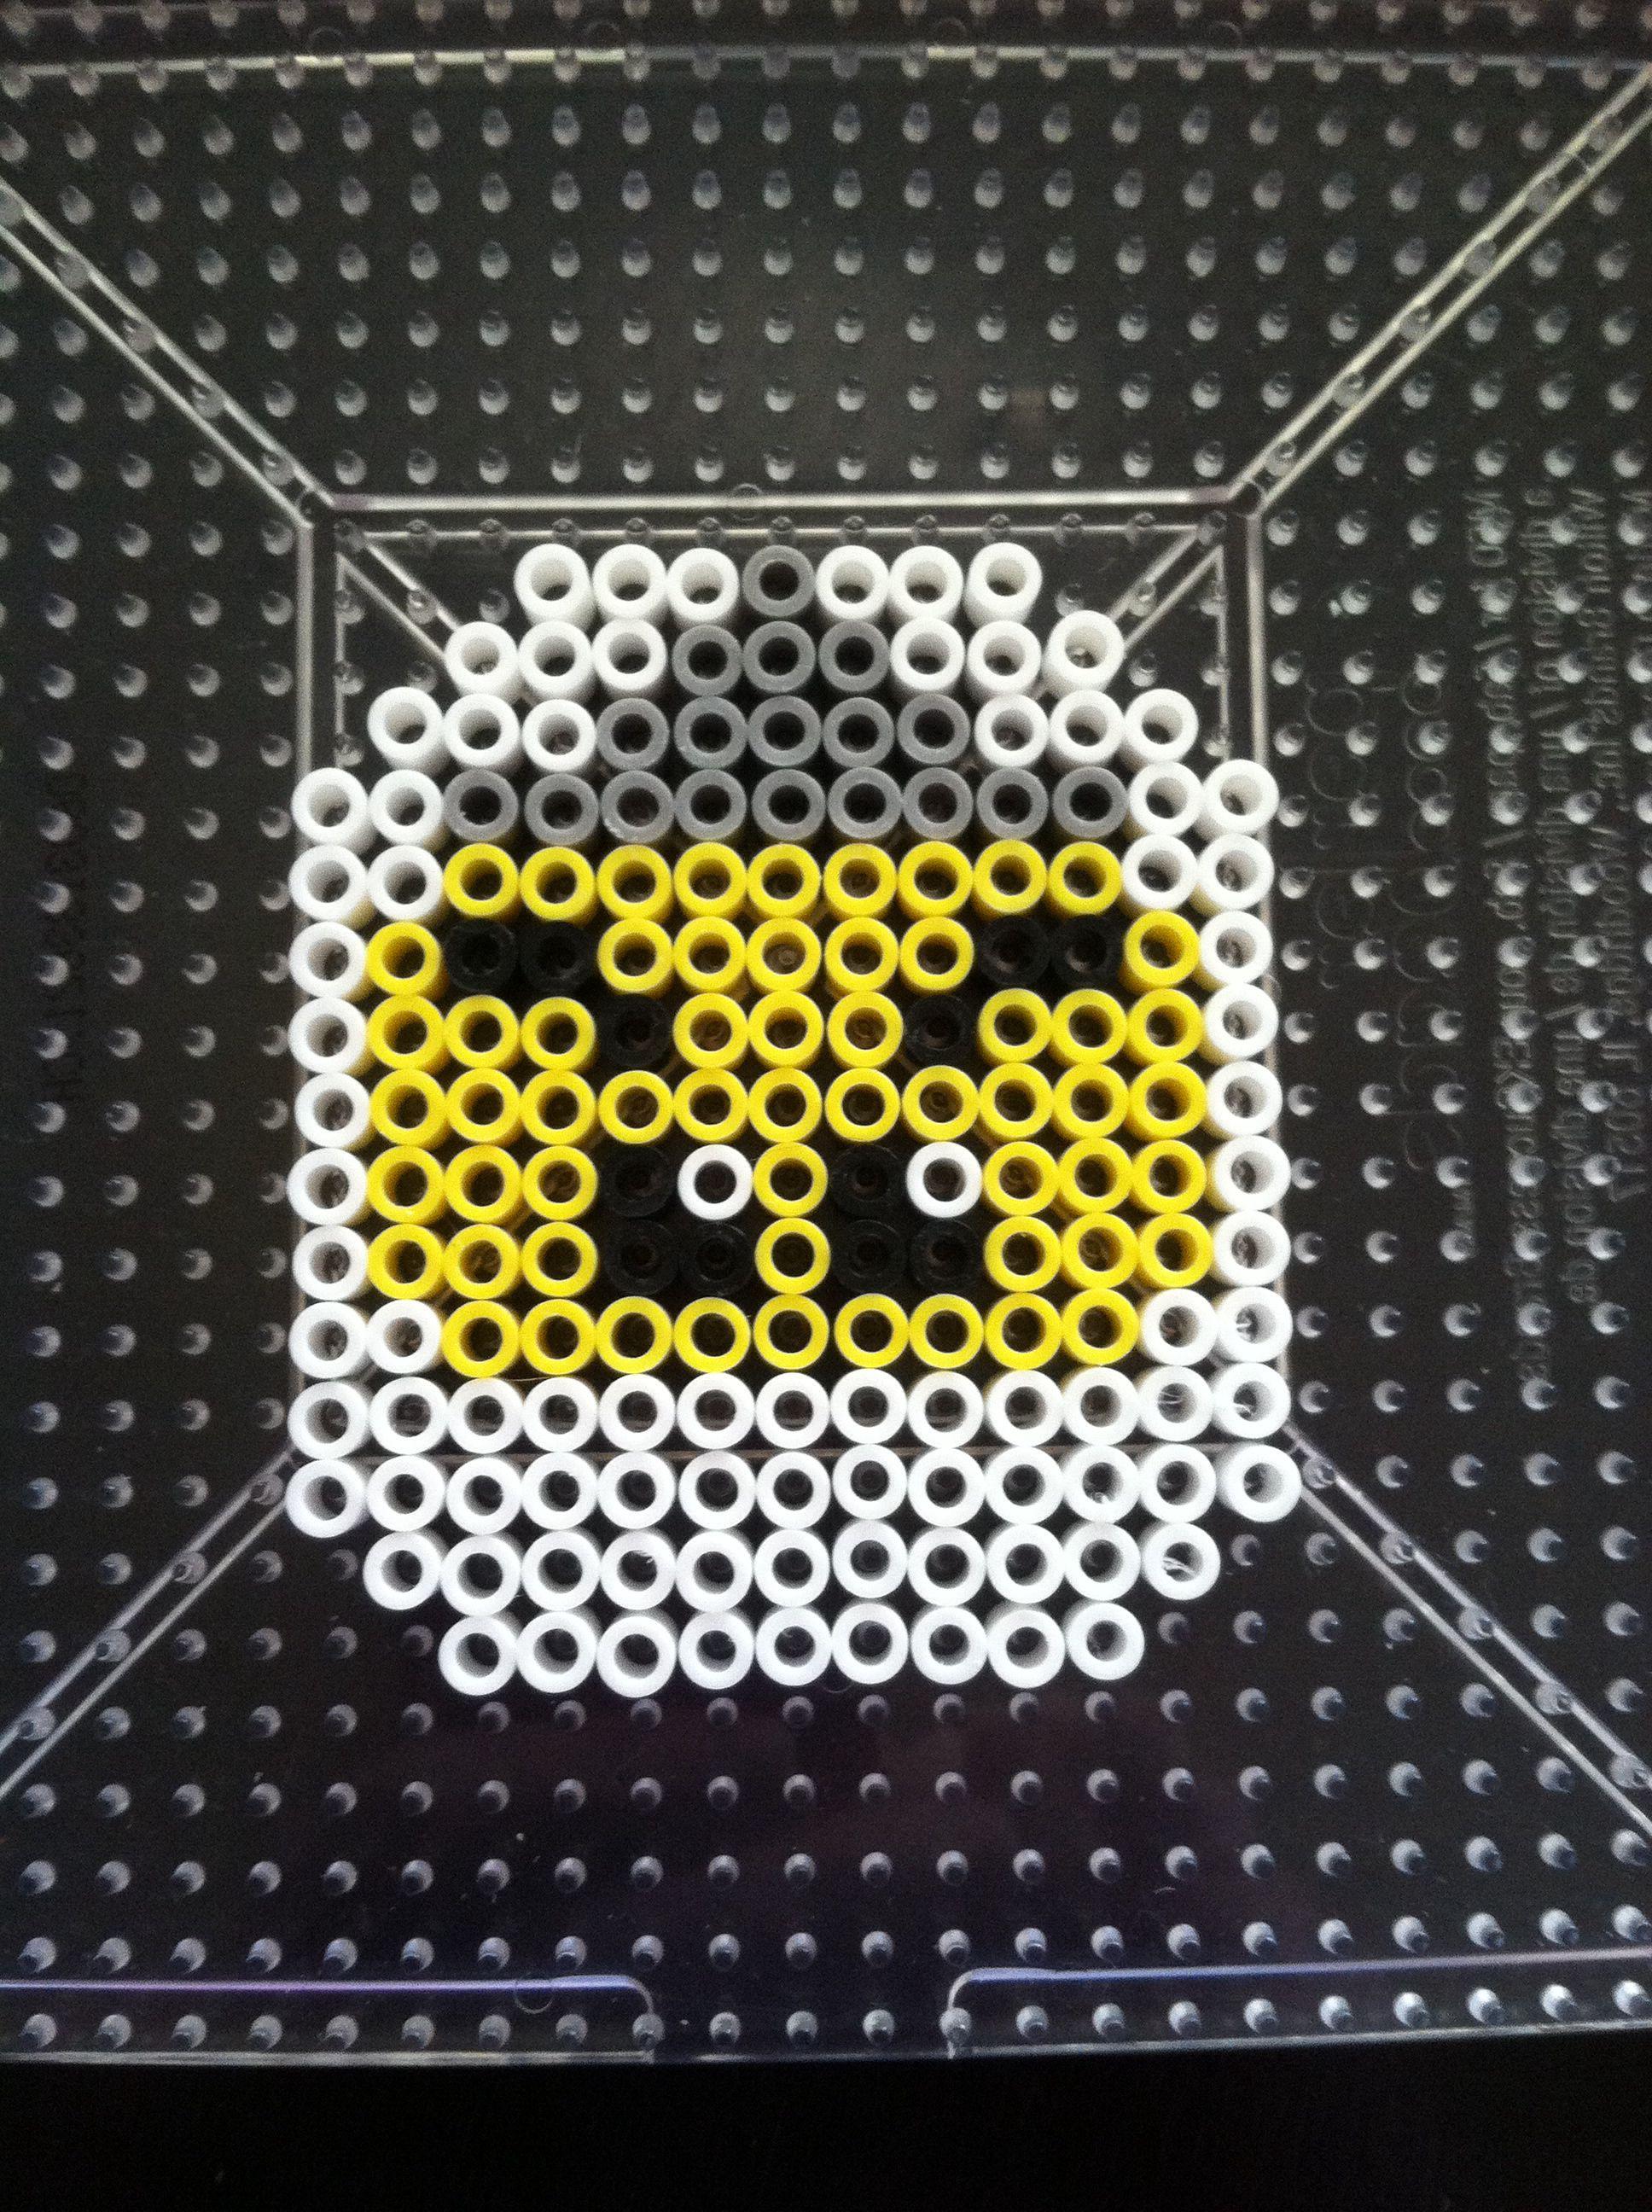 lego ninjago basteln mit kindern b gelperlen b gelperlen vorlagen und hama b gelperlen. Black Bedroom Furniture Sets. Home Design Ideas